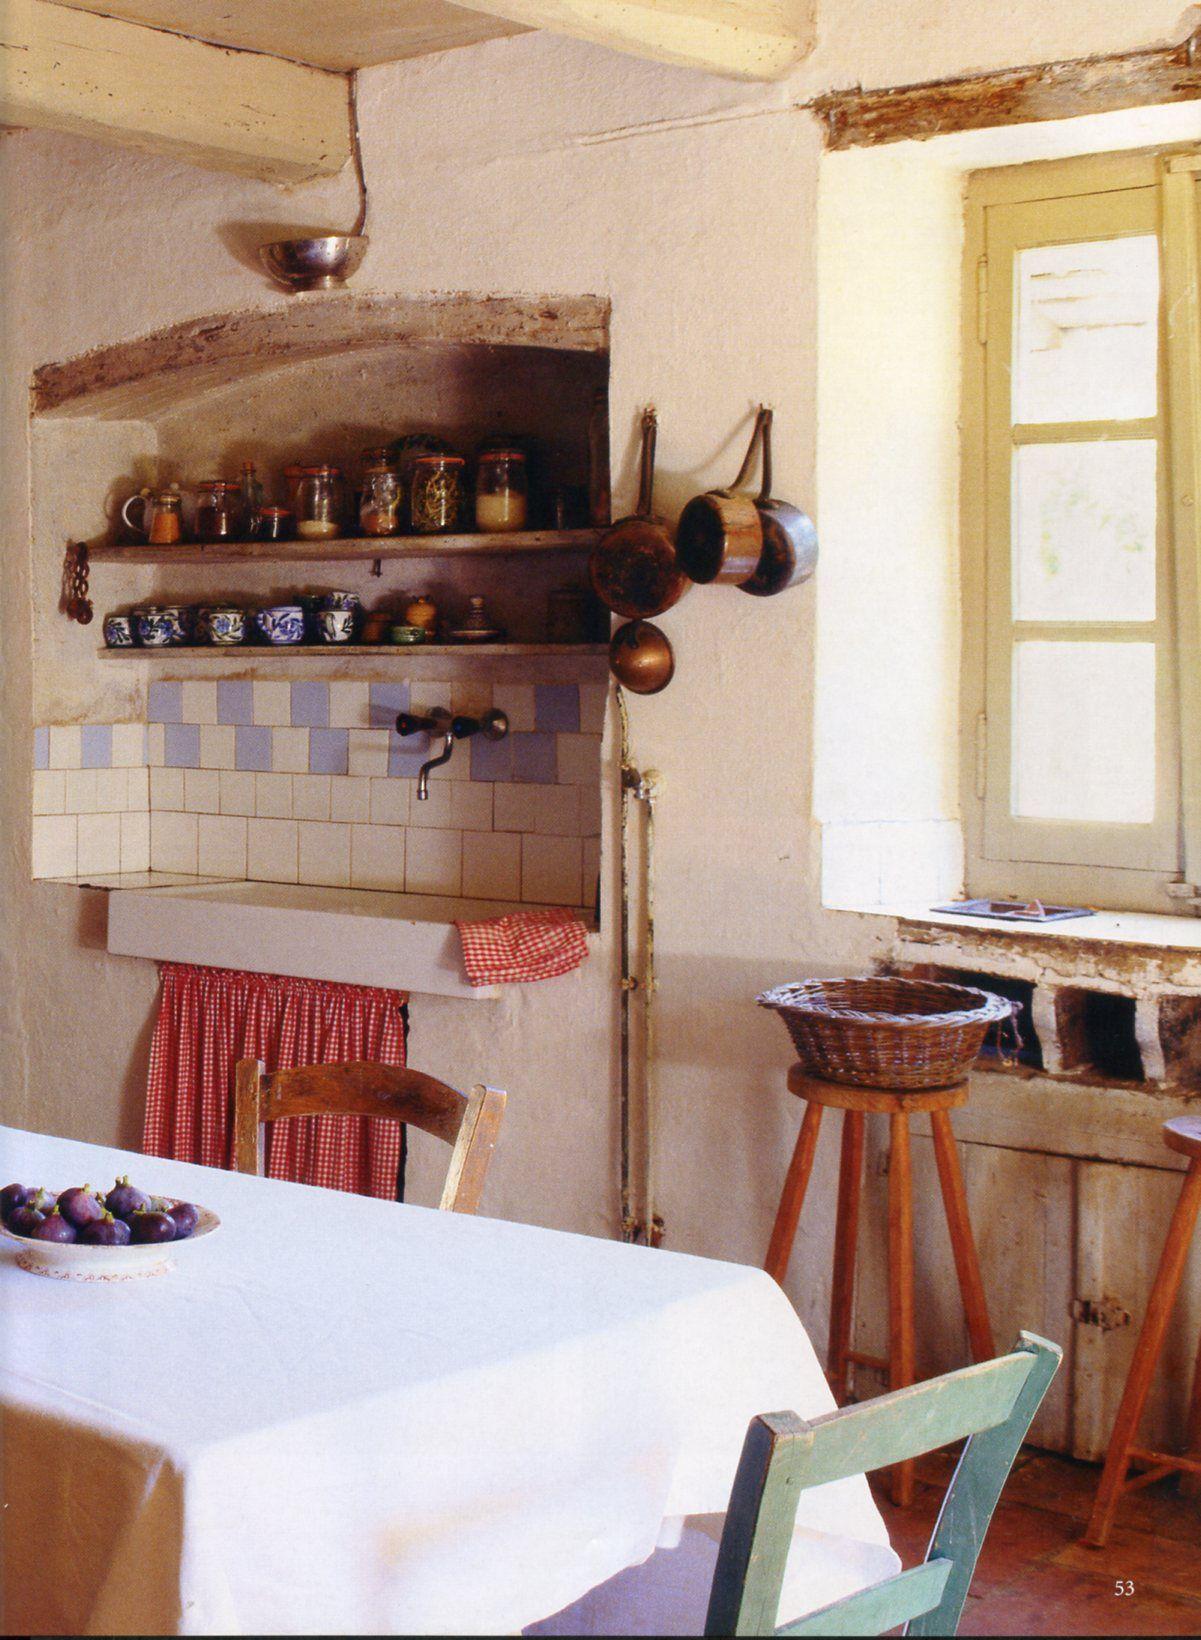 The World of Interiors, January 2012. Photo - Tim Beddow | Cocinas ...